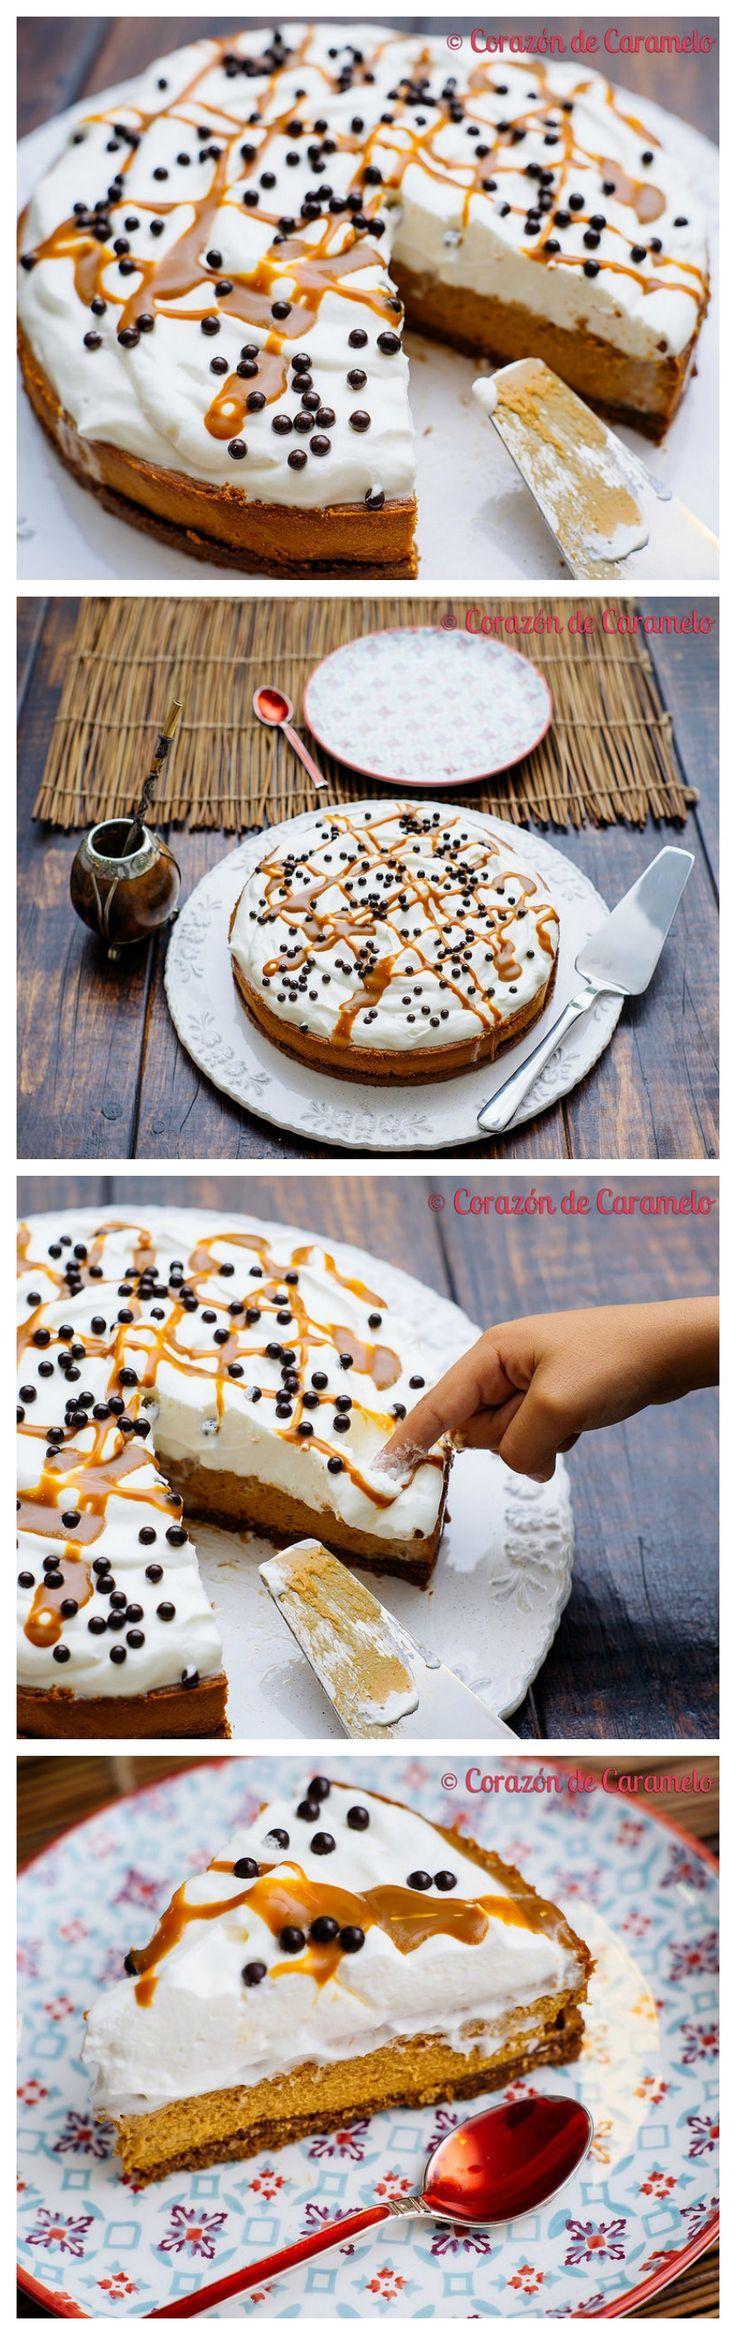 tarta, cheesecake, dulce de leche, nata montada, galleta, pastel de queso